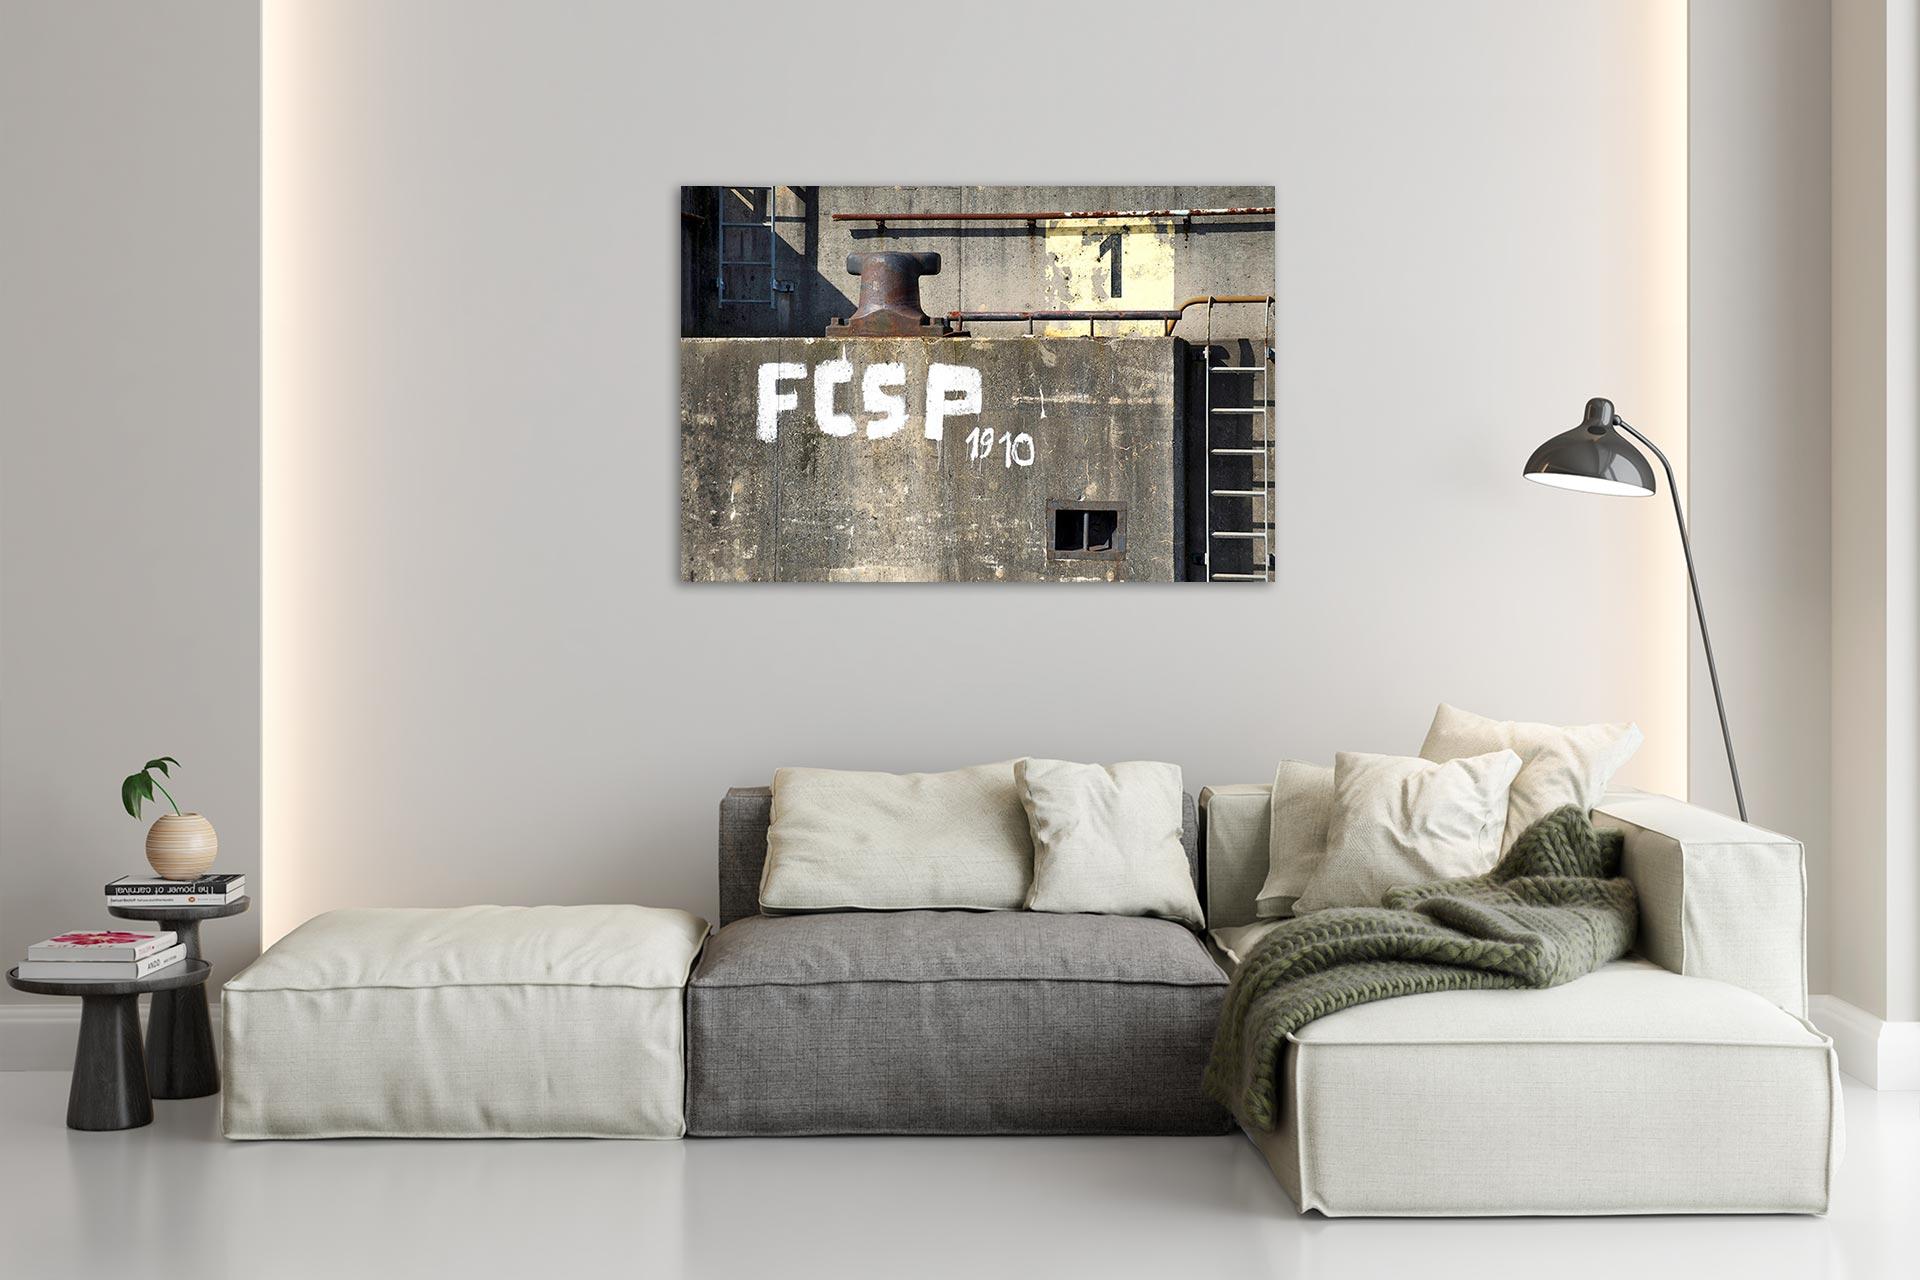 NL100-fcsp-hamburg-wandbild-bild-auf-leinwand-acrylglas-aludibond-wohnzimmer